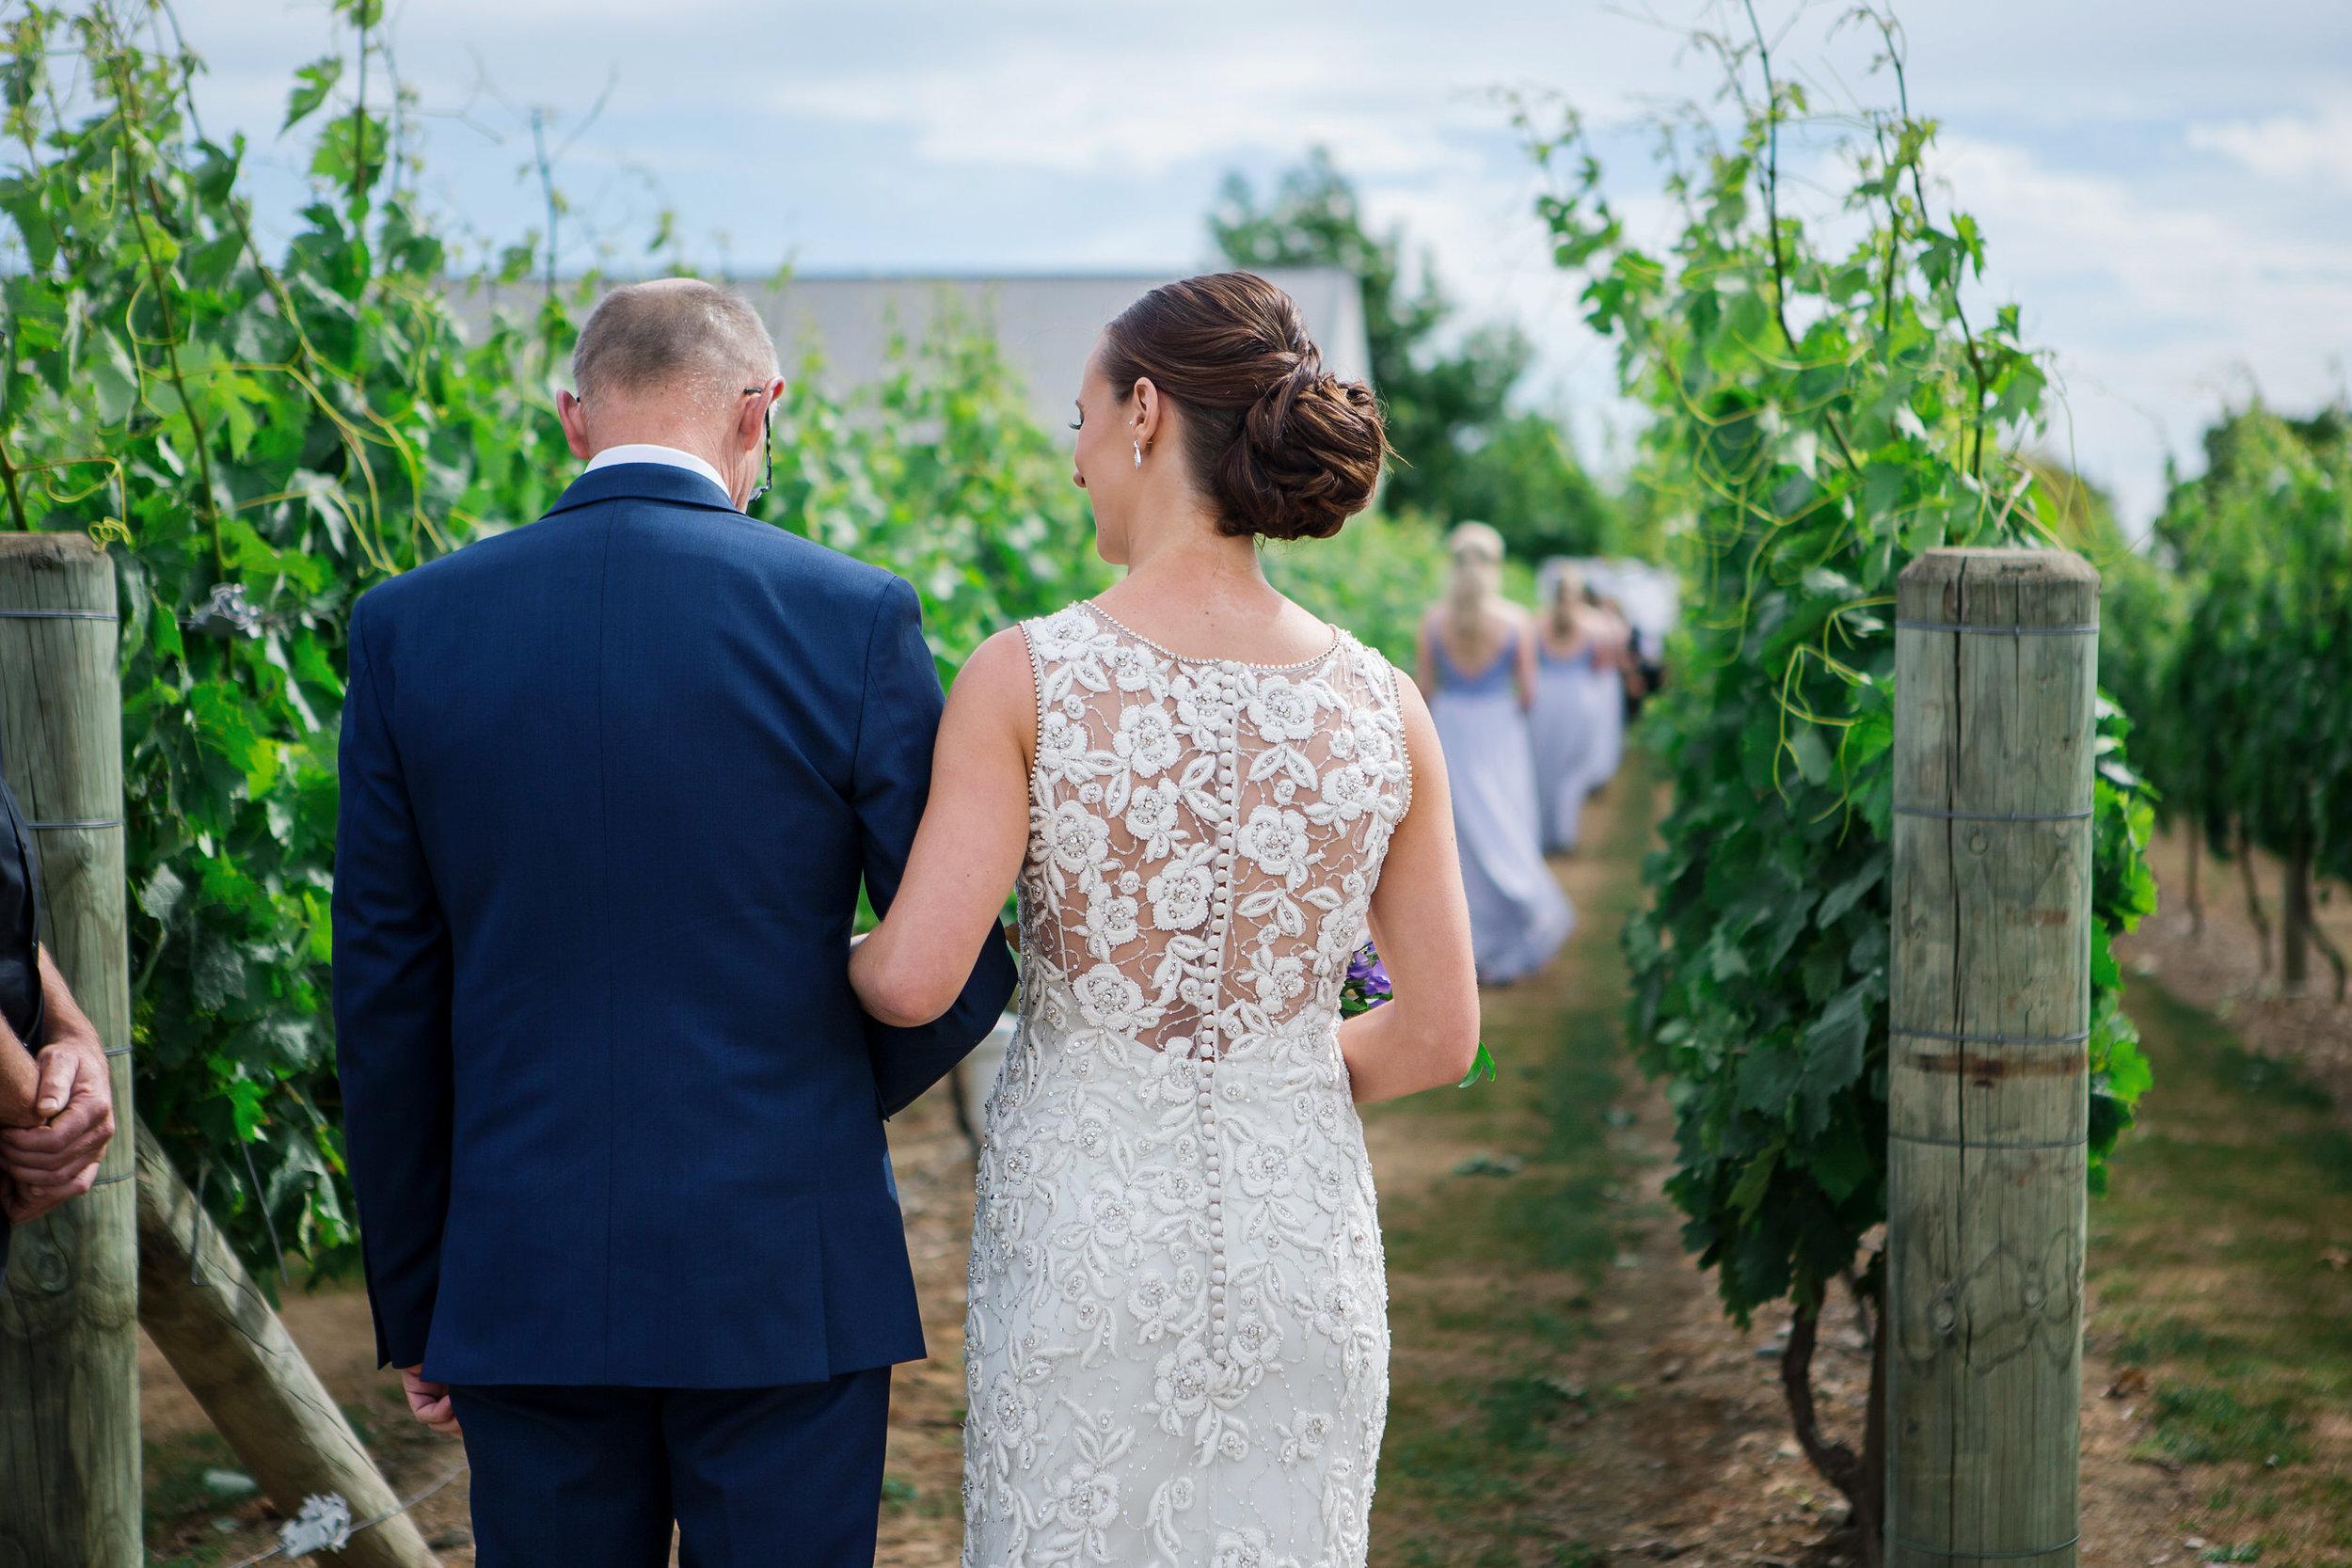 Martinborough-Poppies-Wedding-Caine-Eloise-Toni-Larsen-0076.jpg